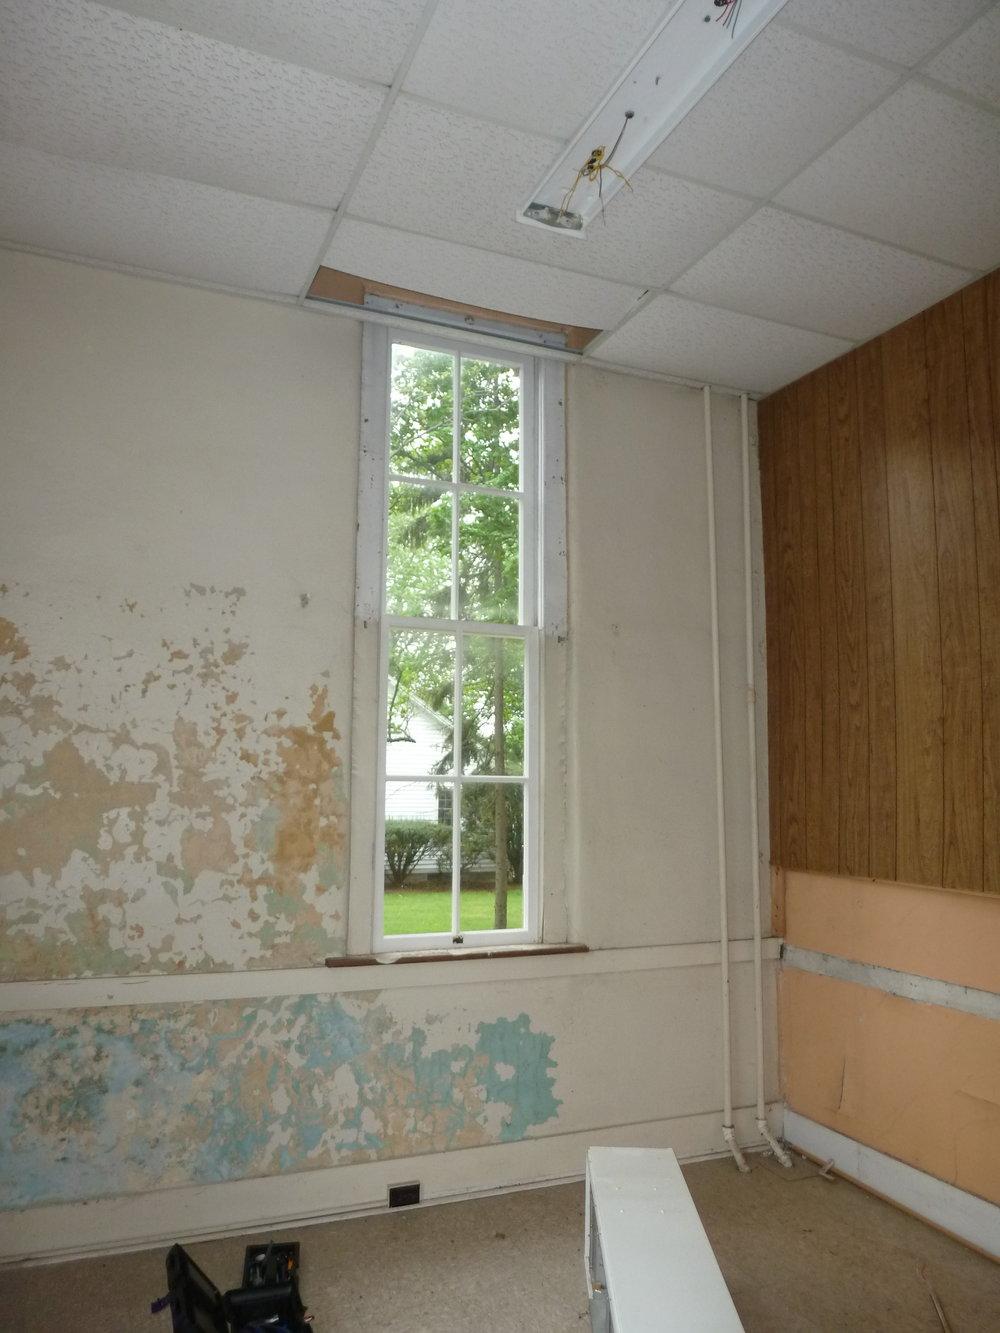 West window of the bathroom